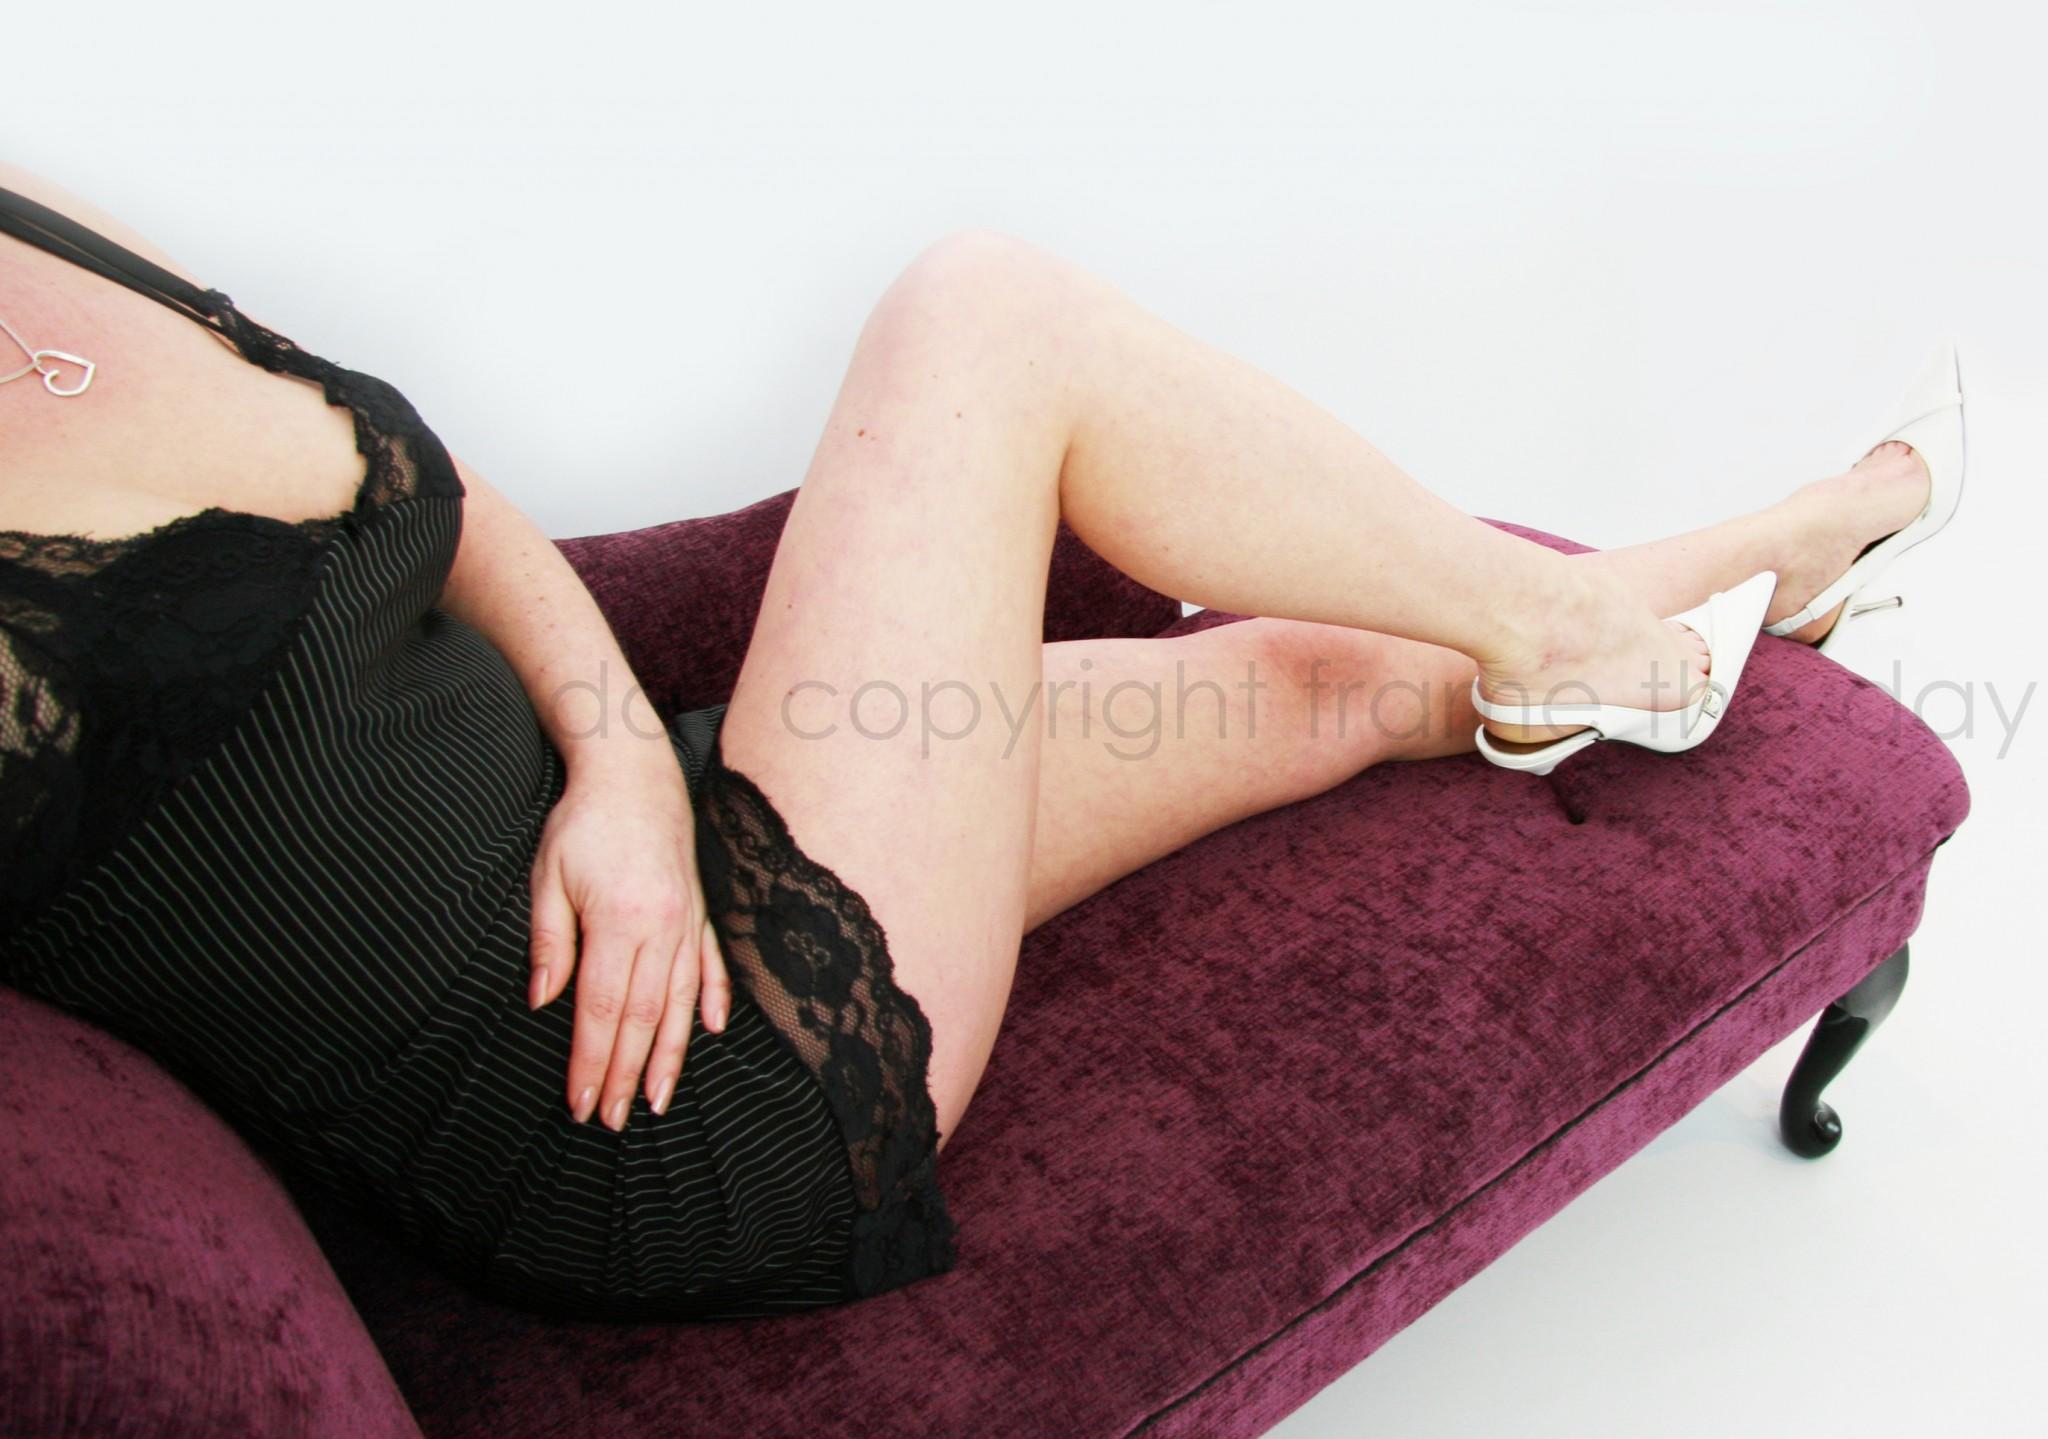 g cropped boudoir 4